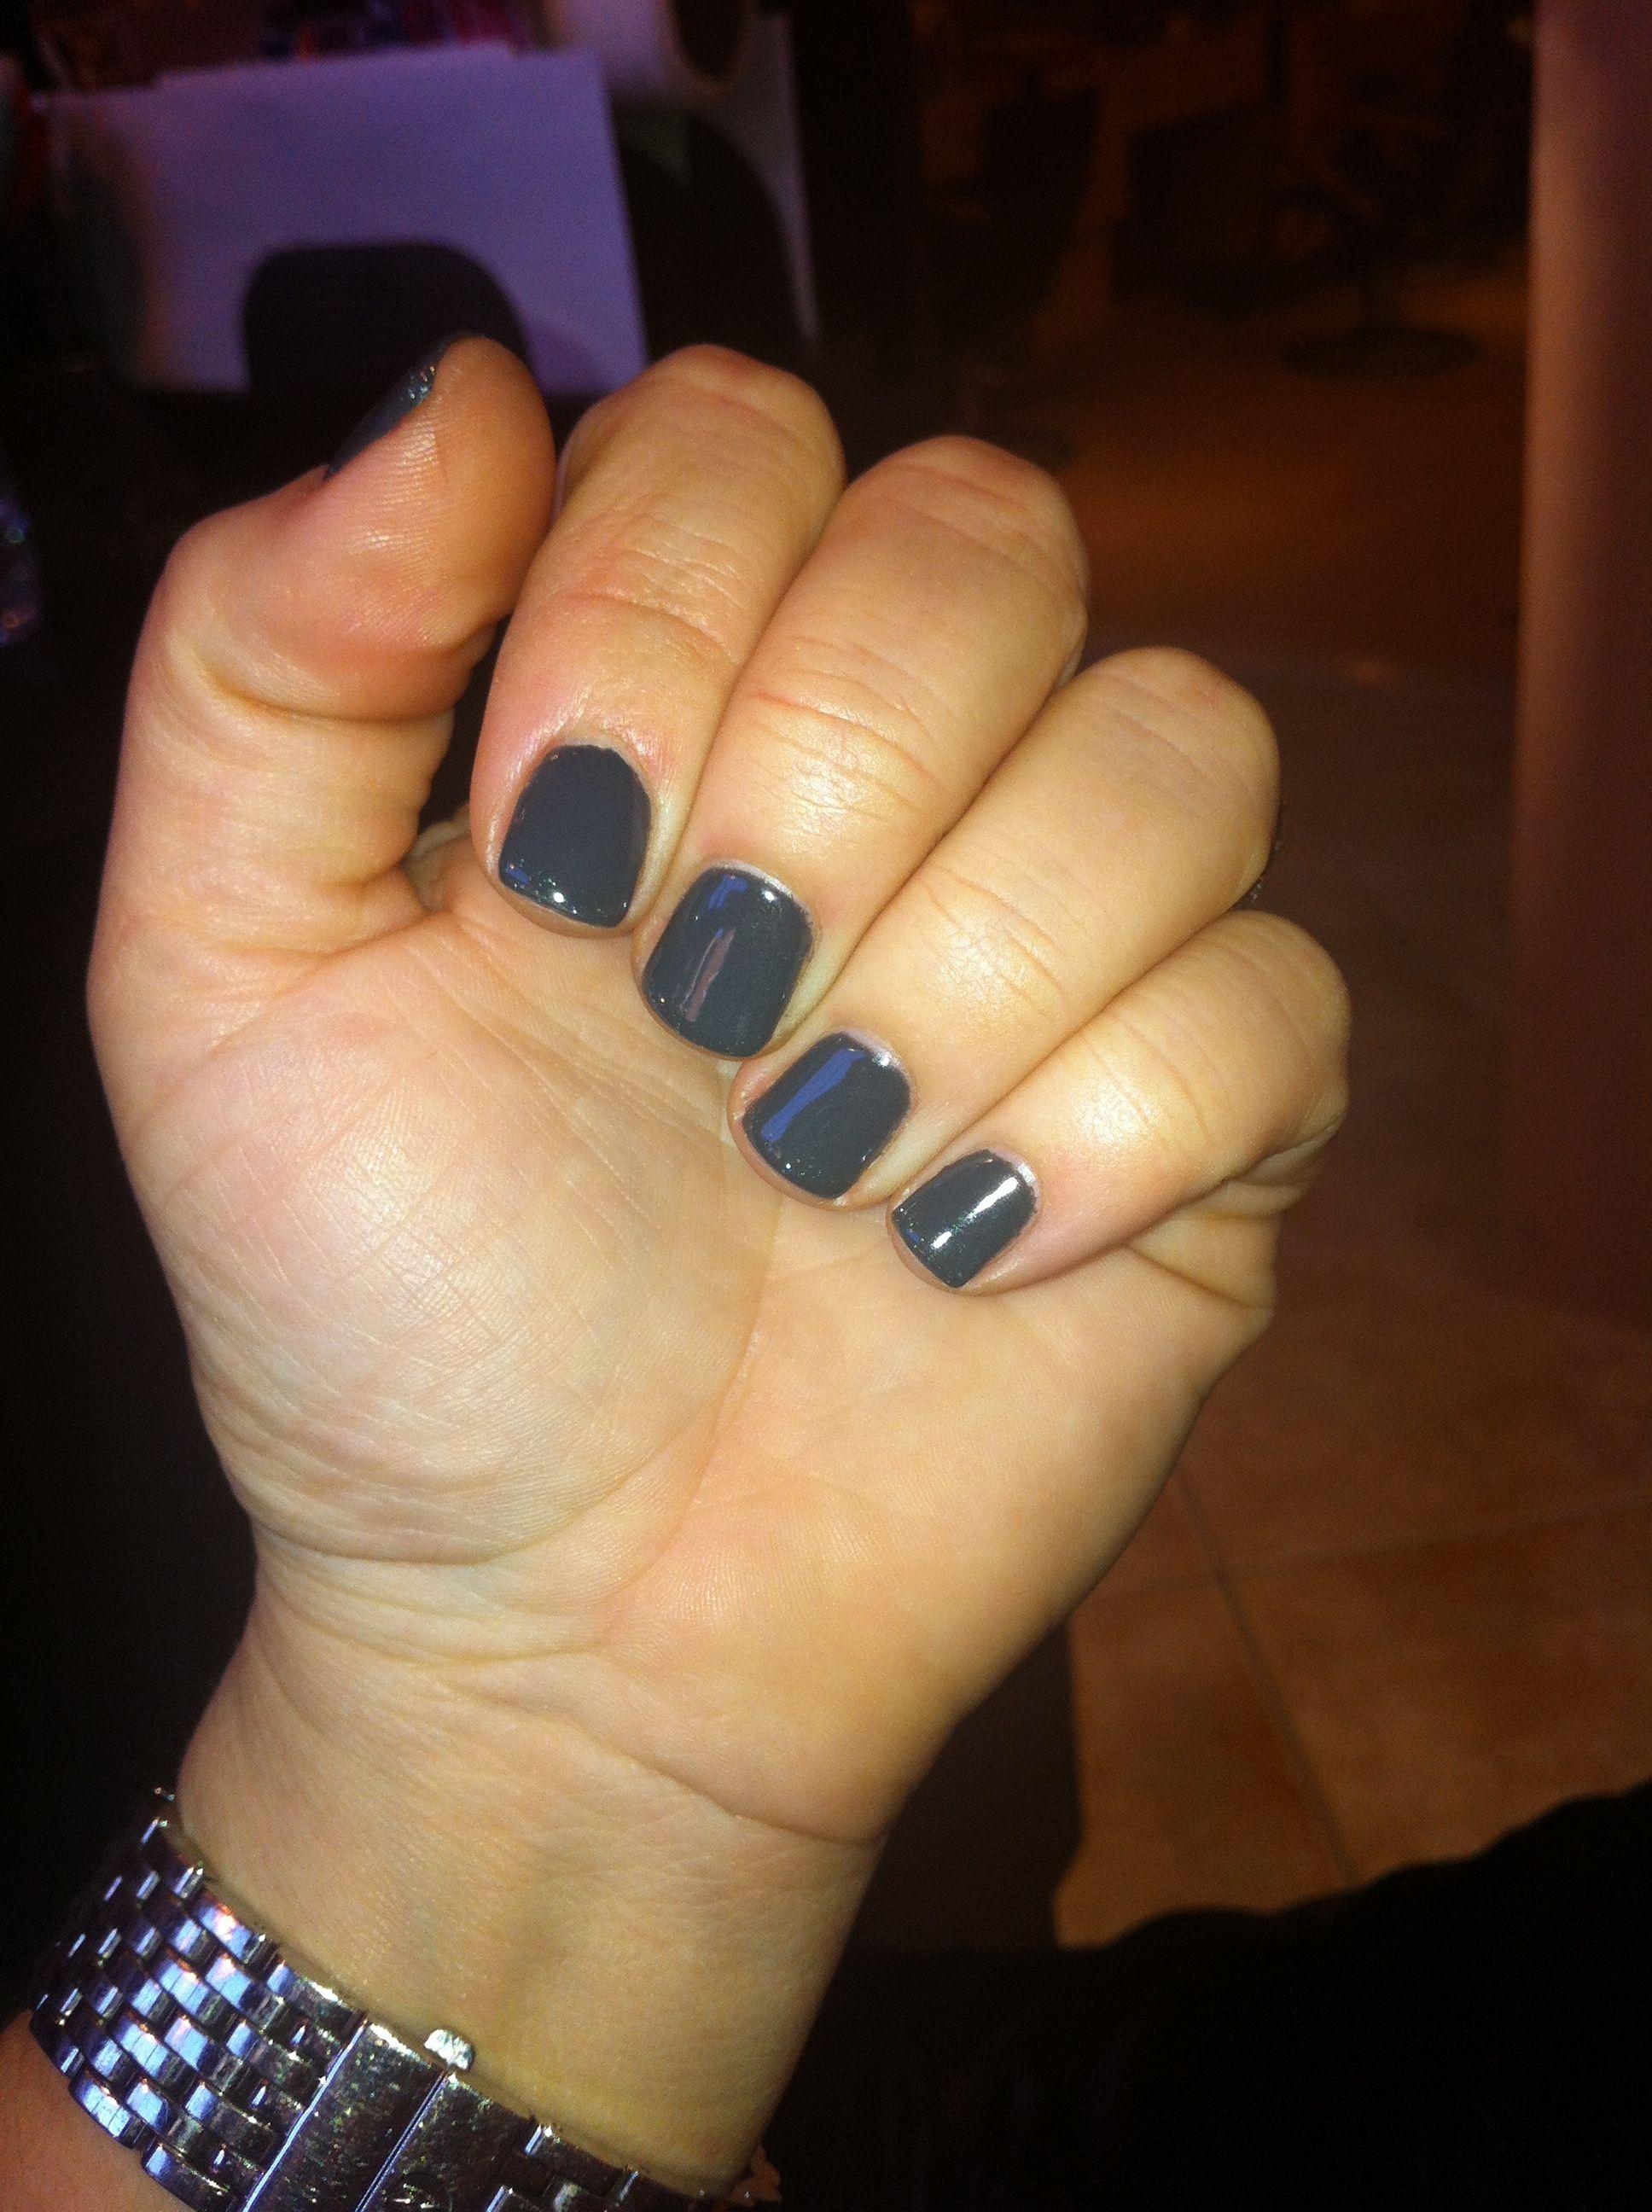 Gelish dark grey uv manicure | health and beauty | Pinterest ...